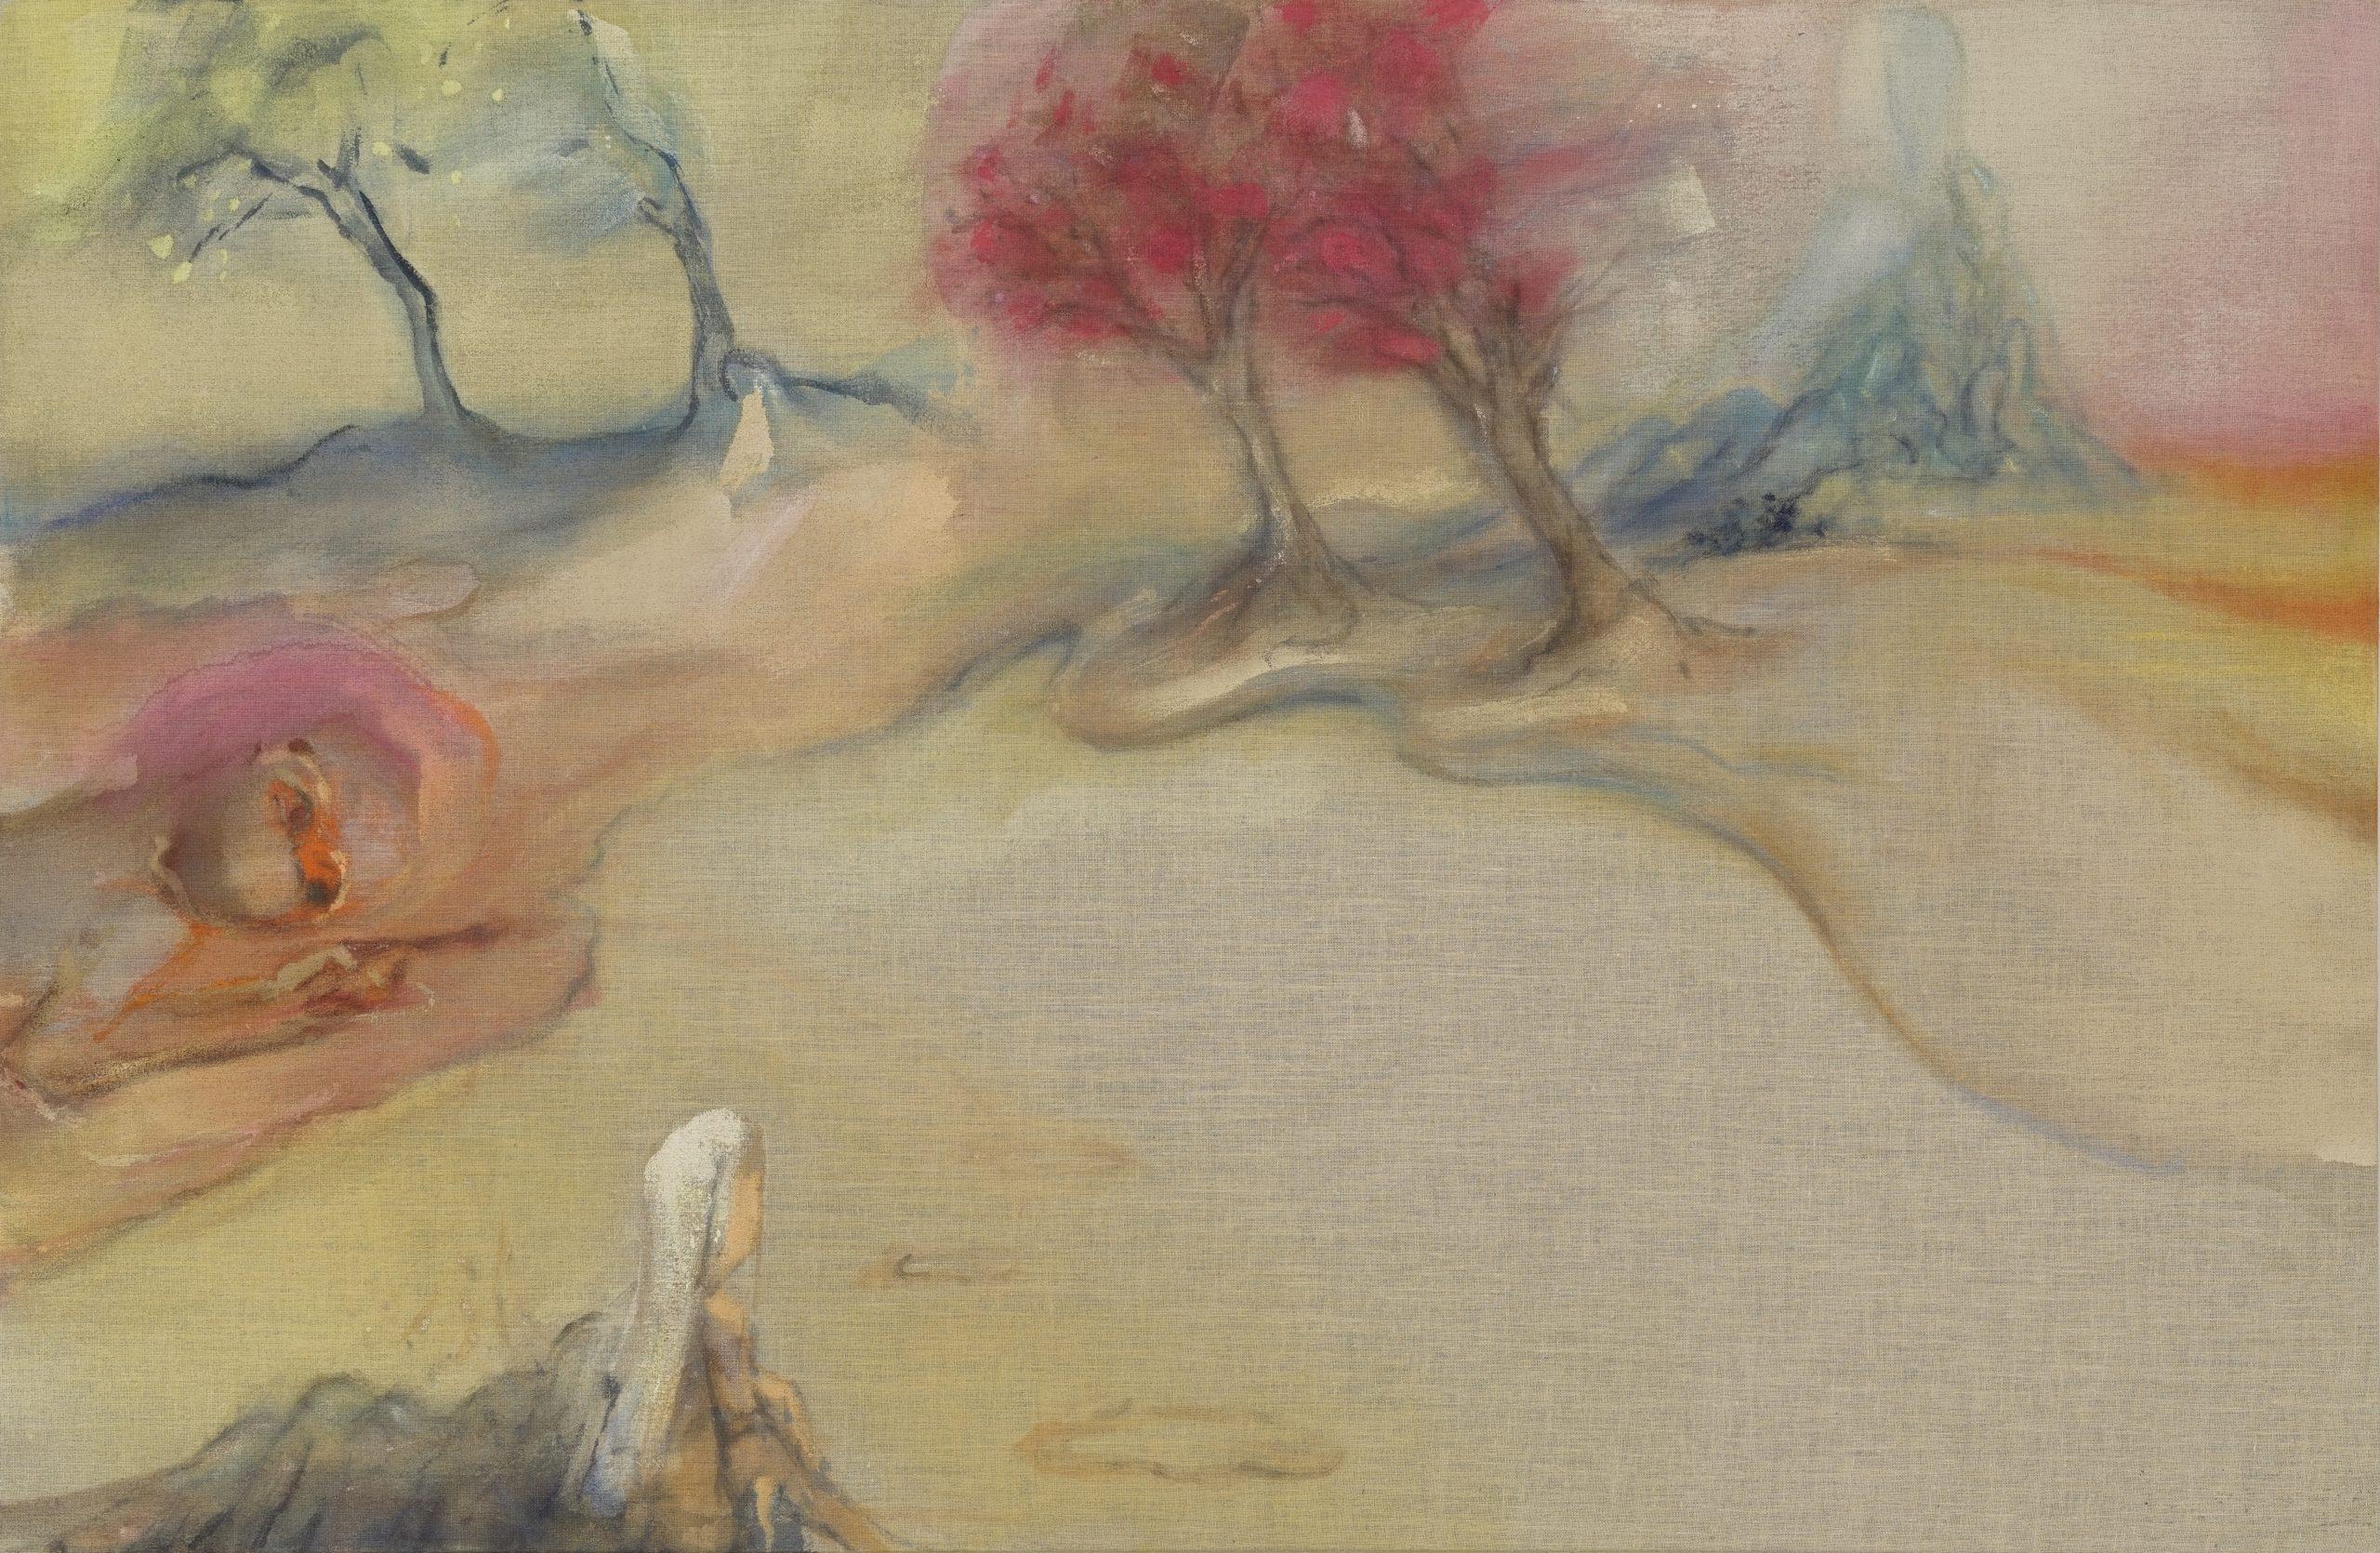 Tempura painting depicting a human figure in a landscape